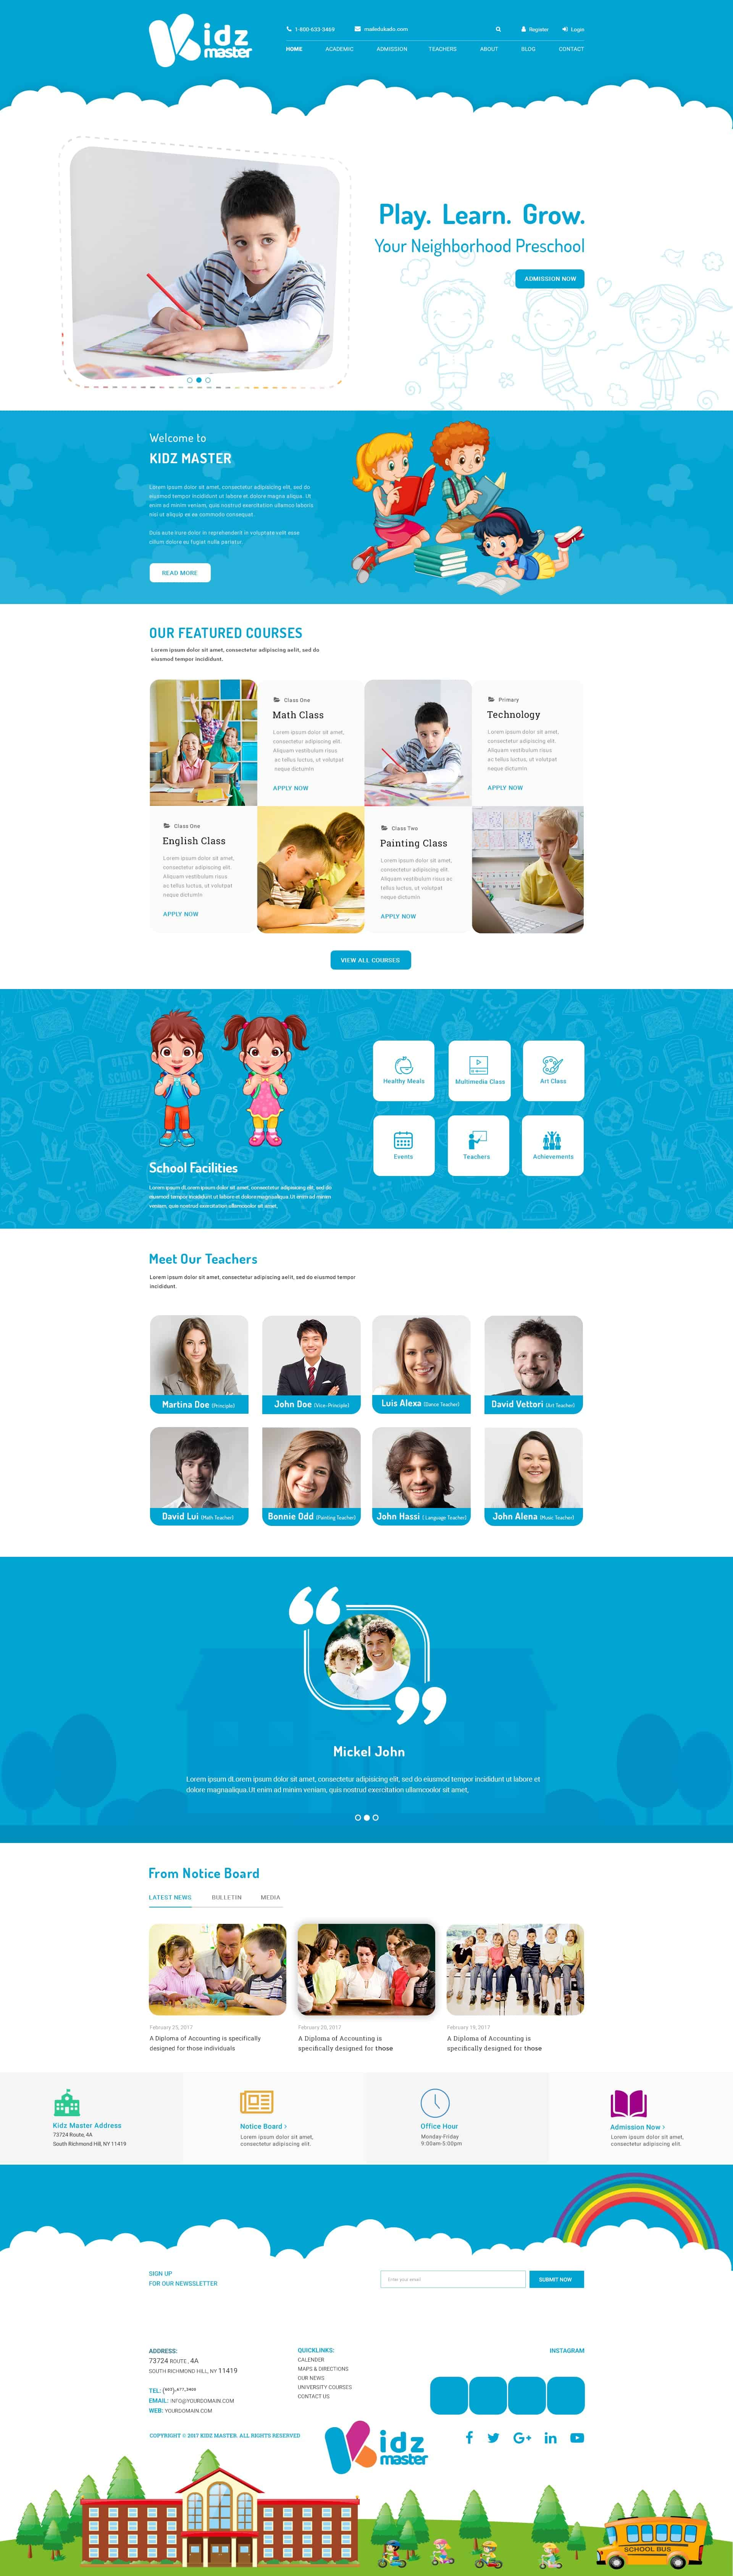 Kidz Master - Free Preschools PSD Resource 1